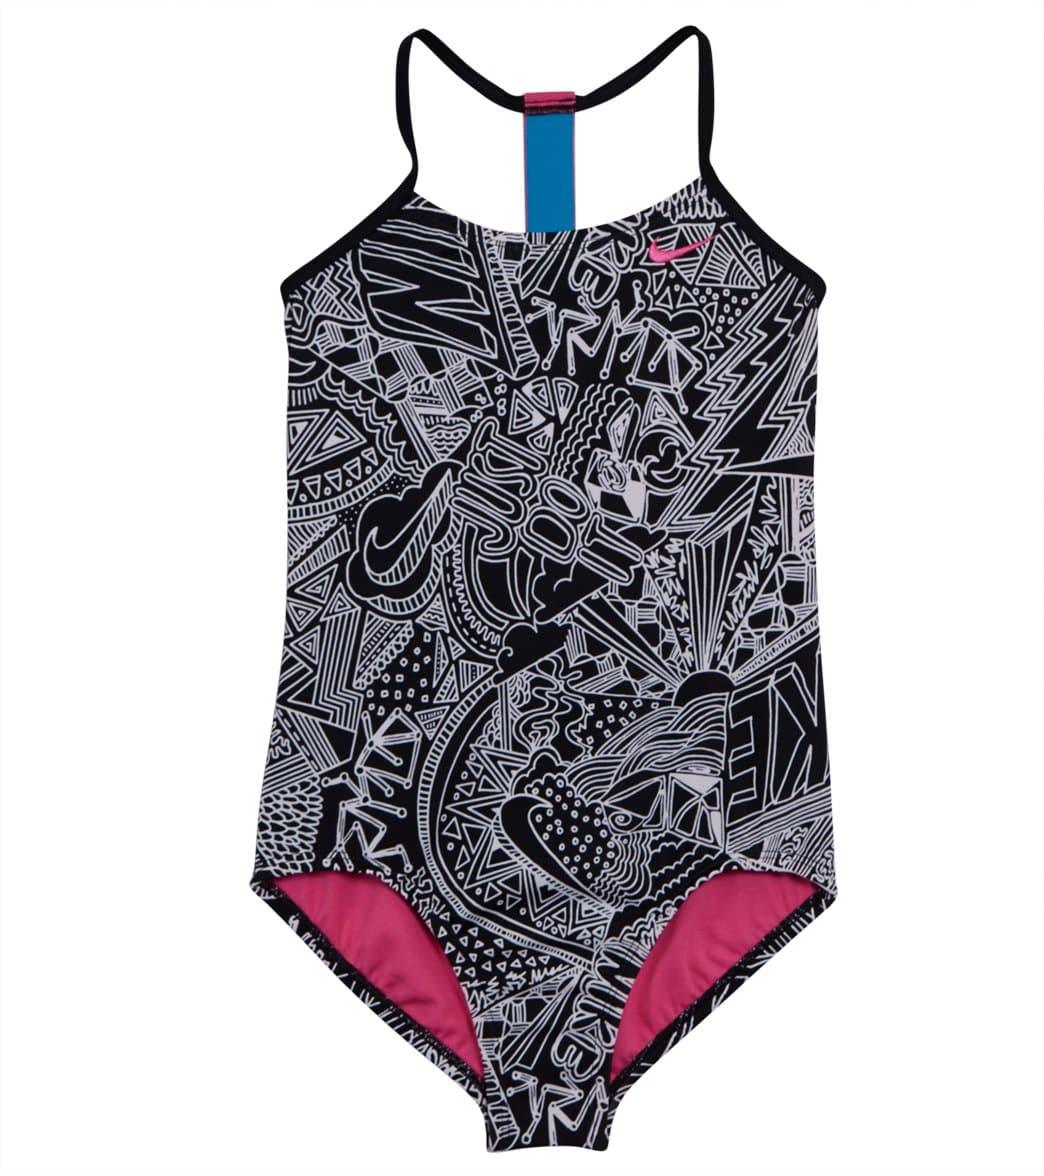 c179a3f4c5e Nike Girls' Doodle T-back One Piece Swimsuit (Big Kid)